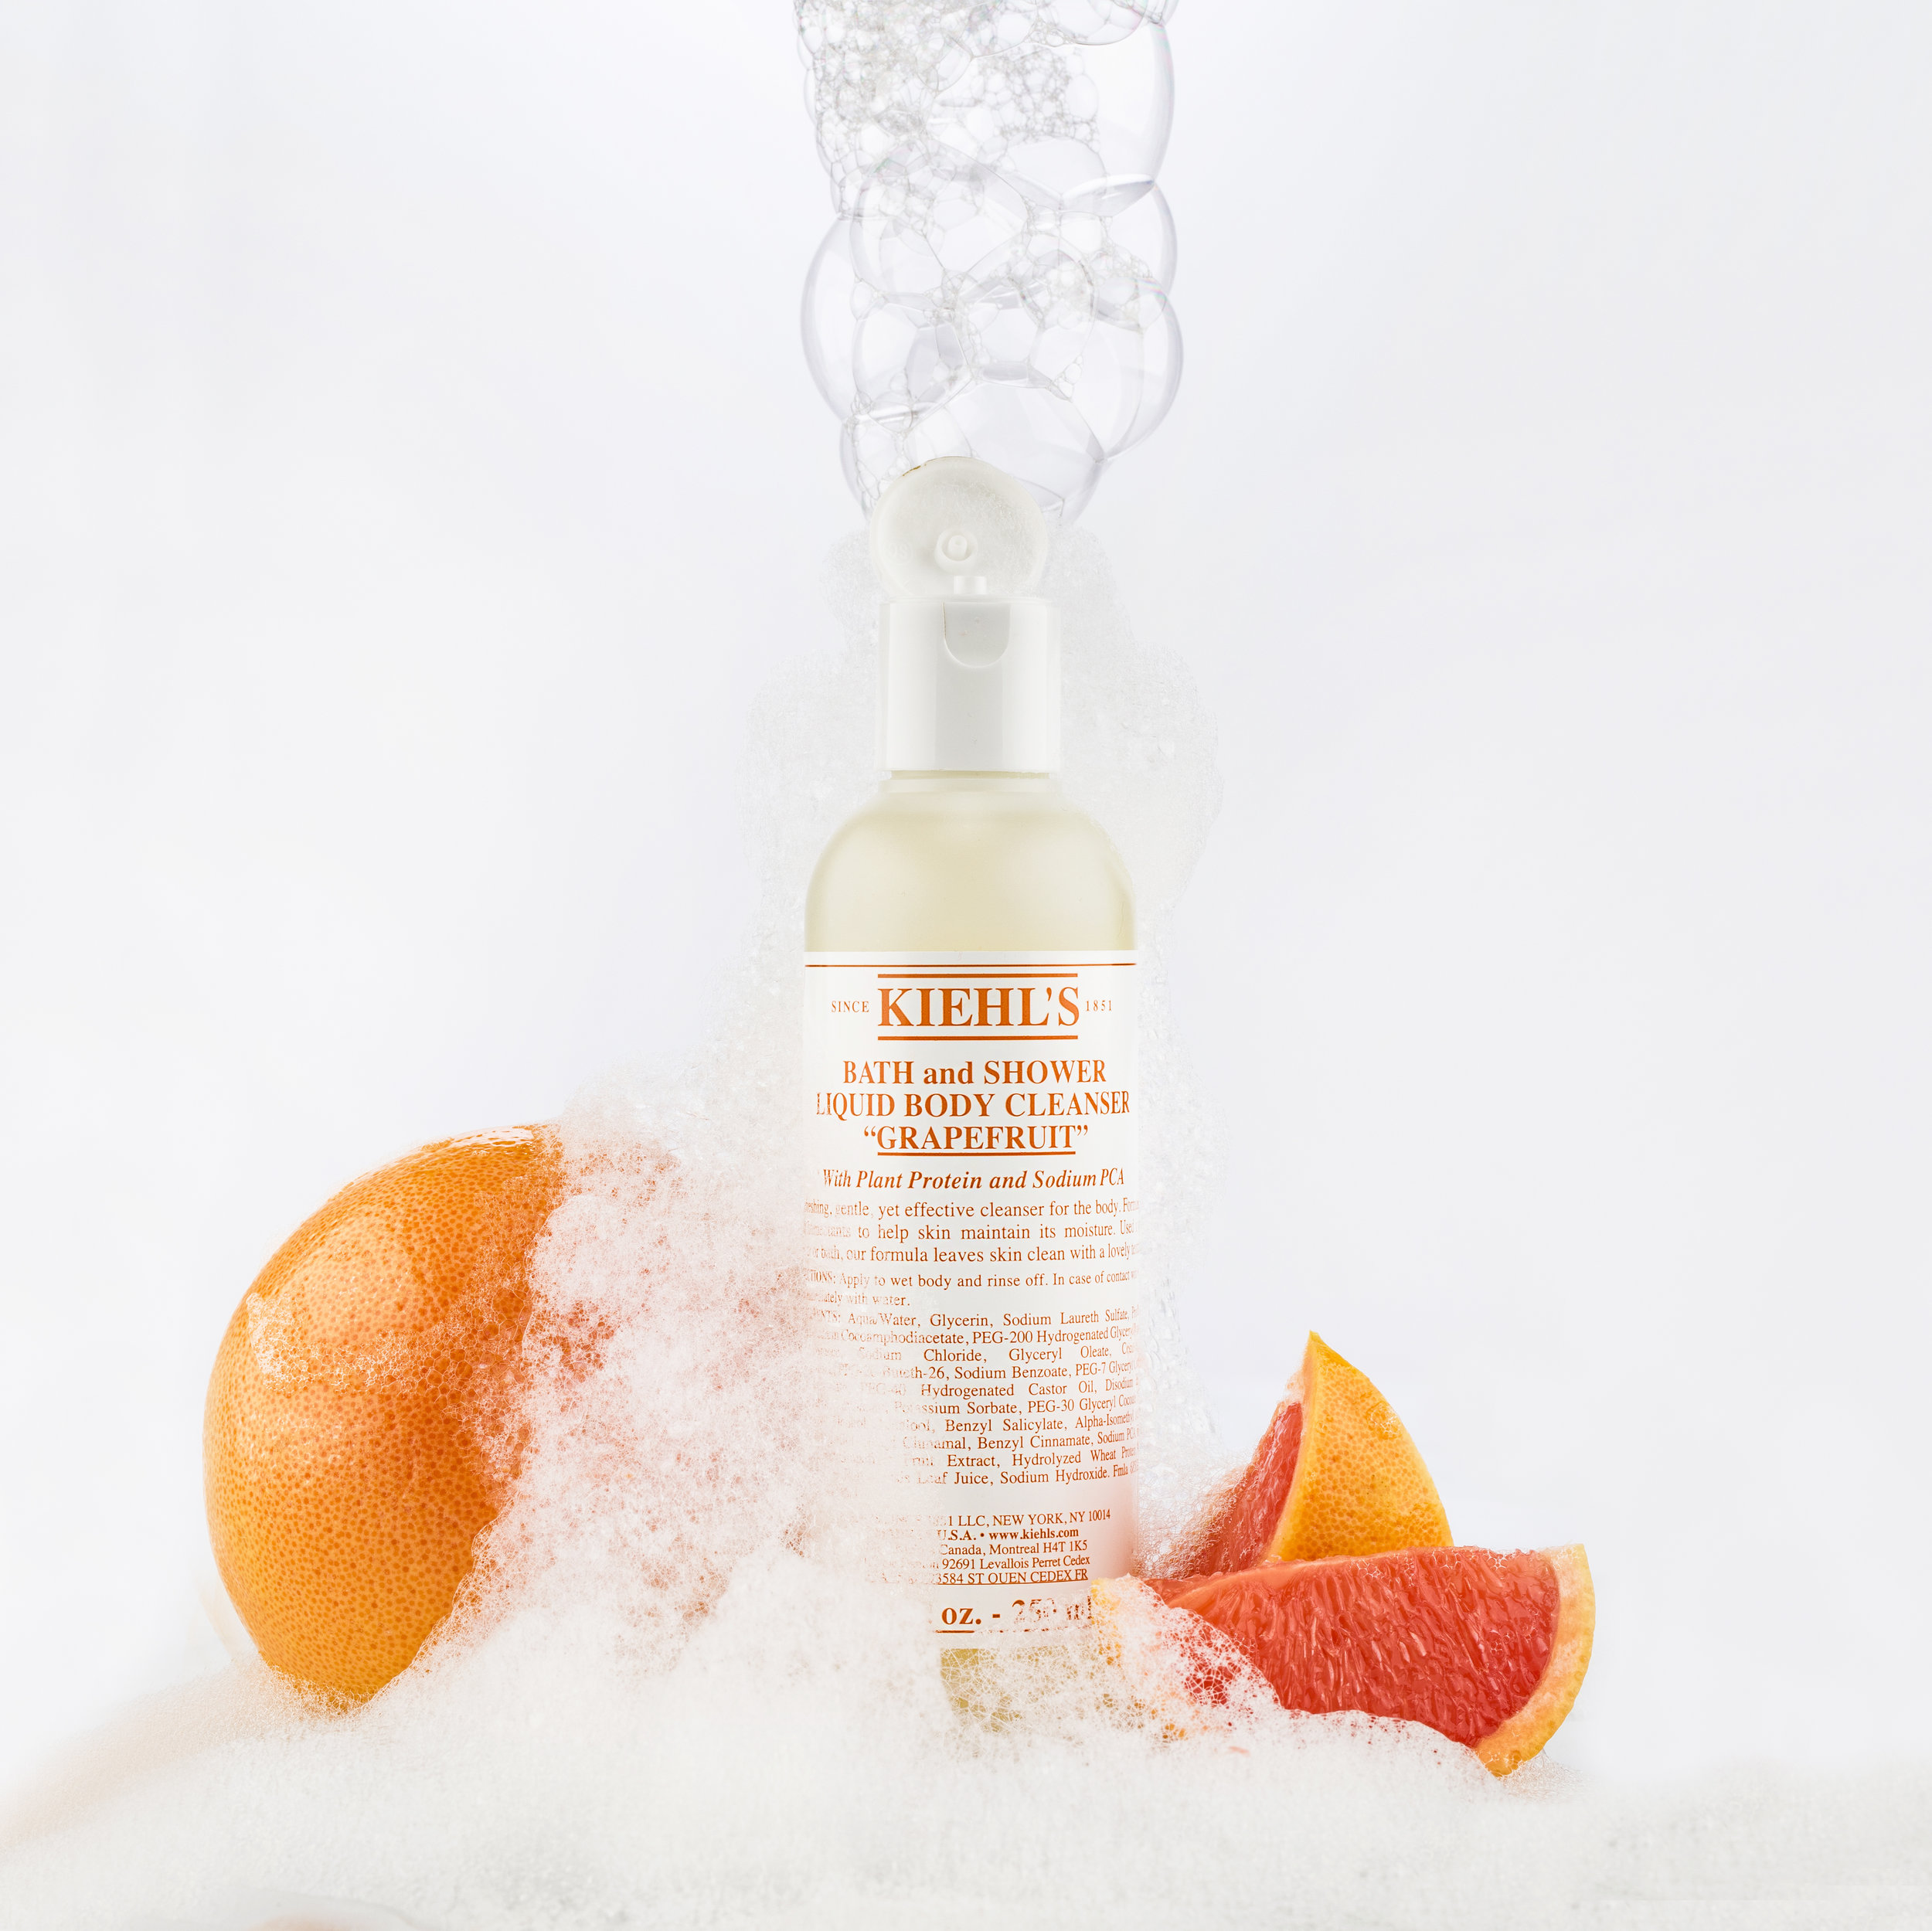 Bath_Shower_Liquid_Body_Cleanser_Grapefruit_3700194712259_LV1_0752 square.jpg